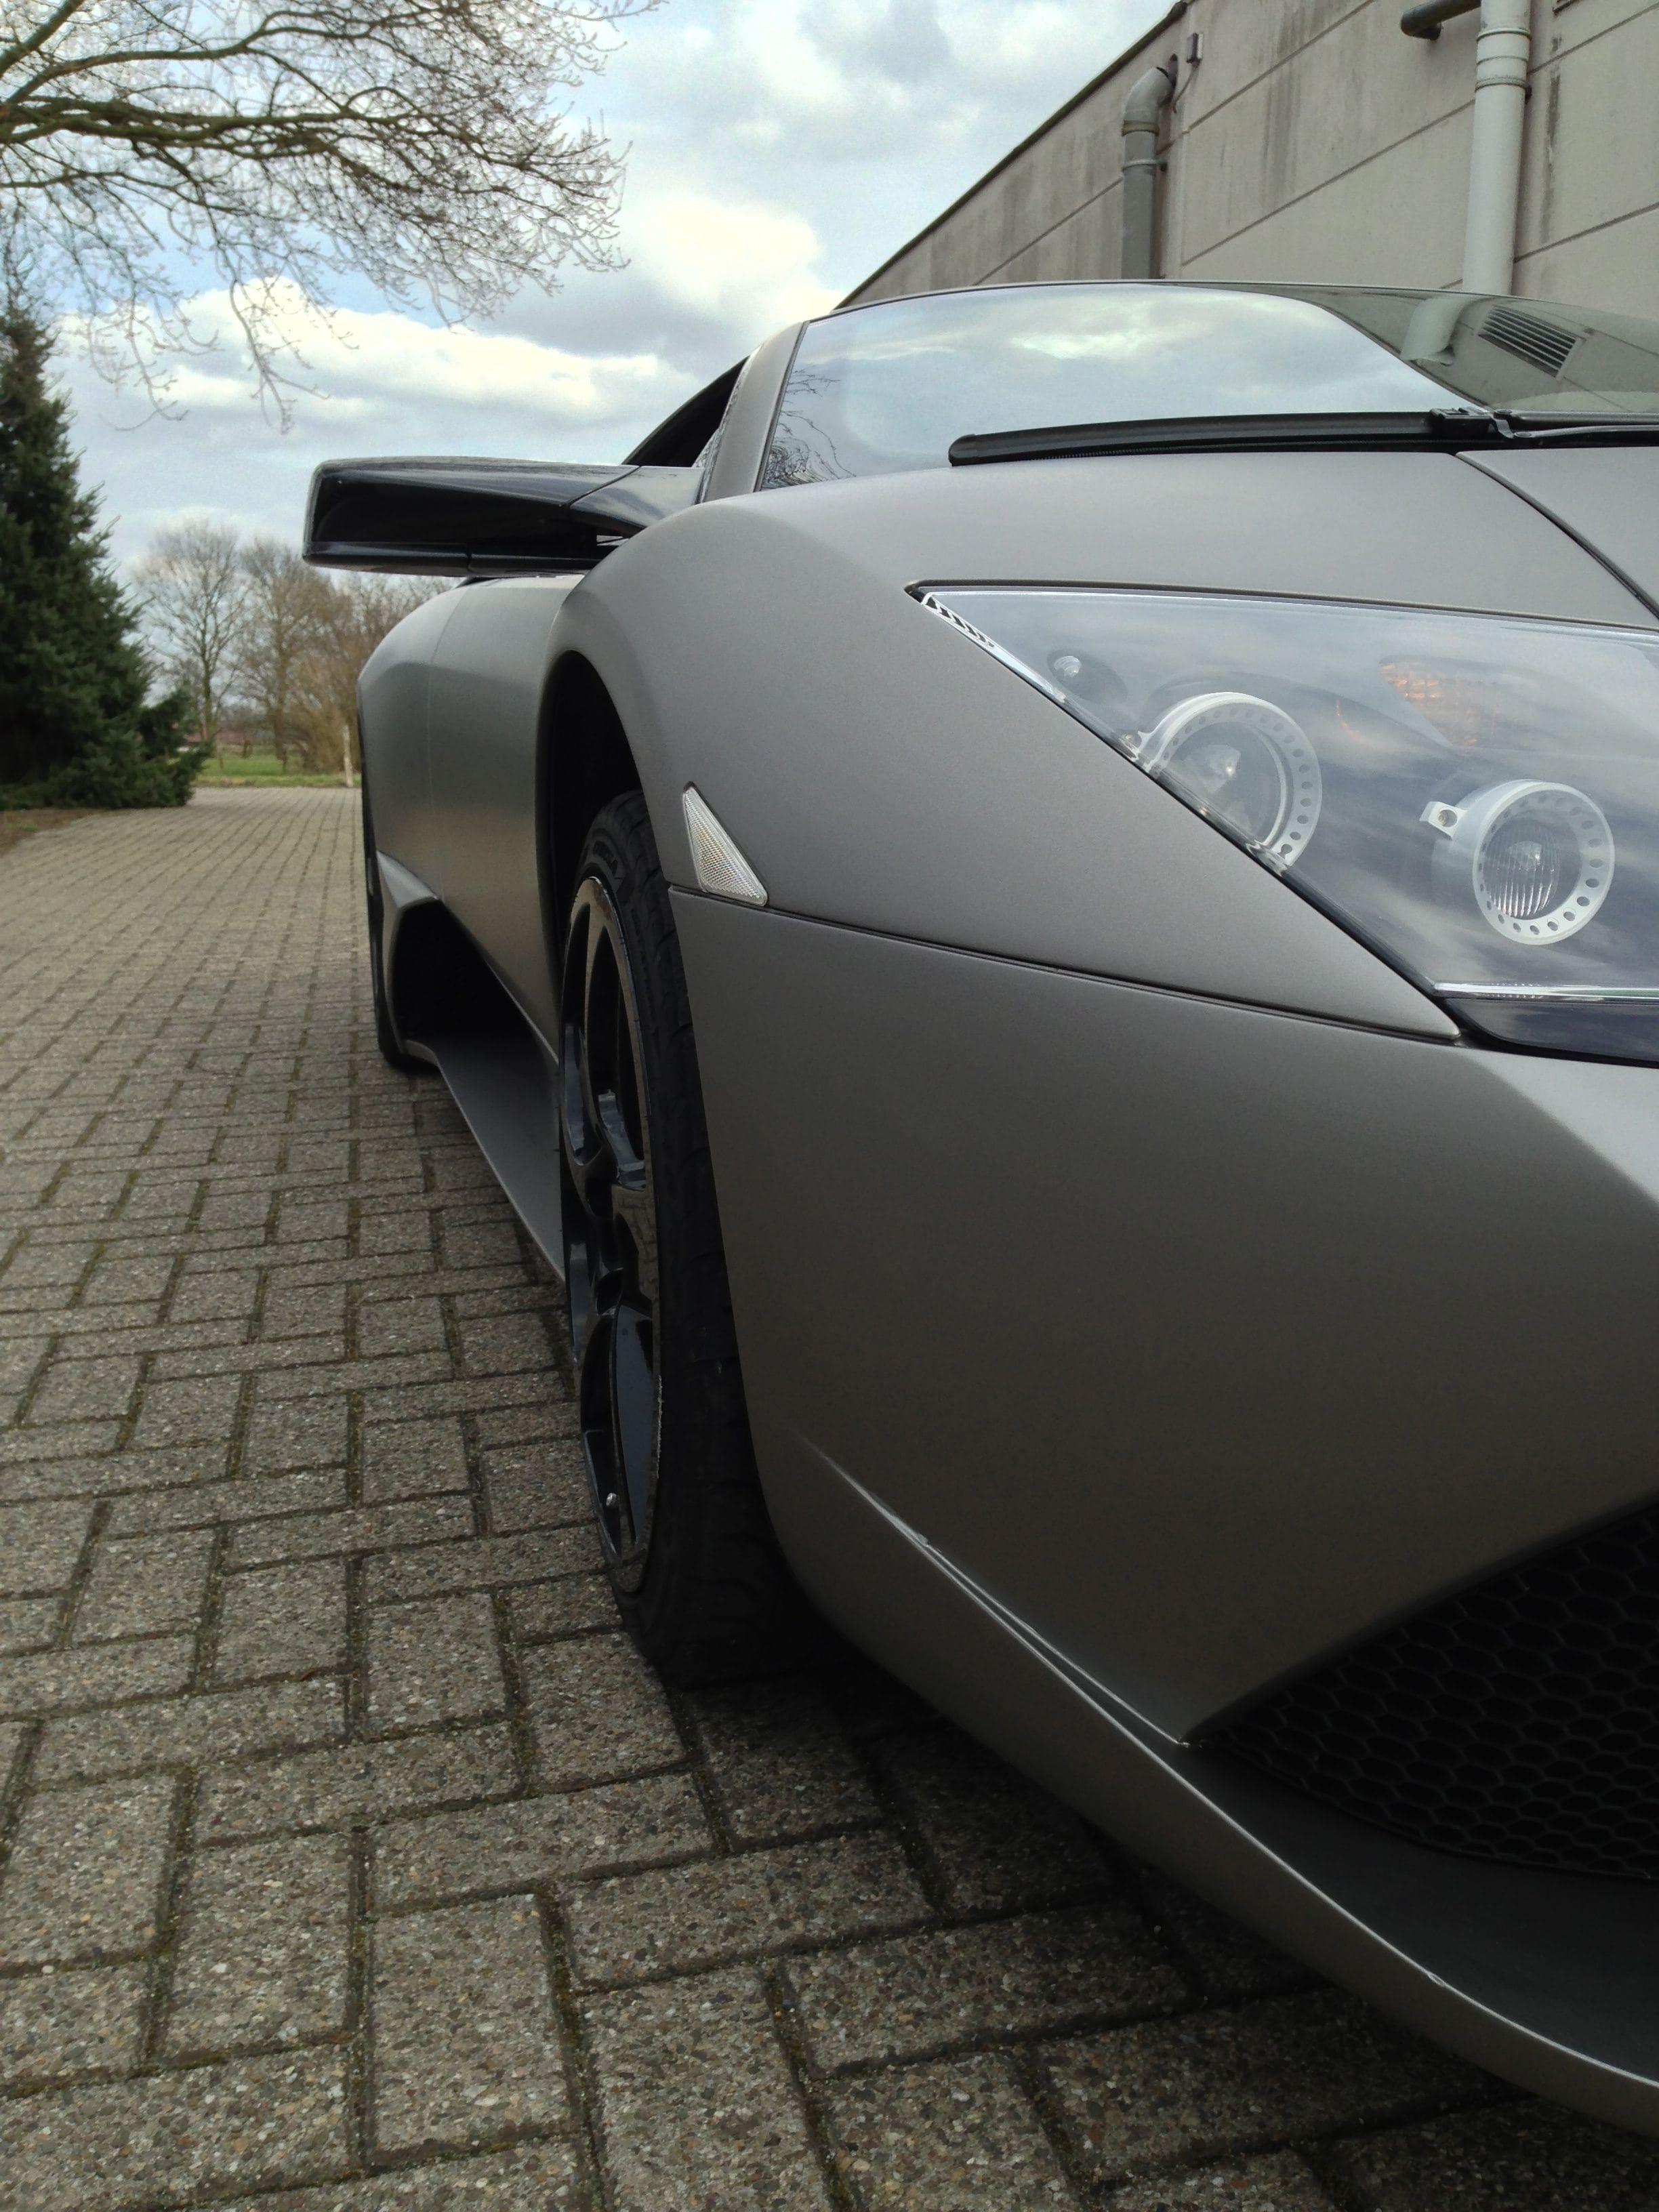 Lamborghini Murcialago LP670 met Gunpowder Wrap, Carwrapping door Wrapmyride.nu Foto-nr:5978, ©2021